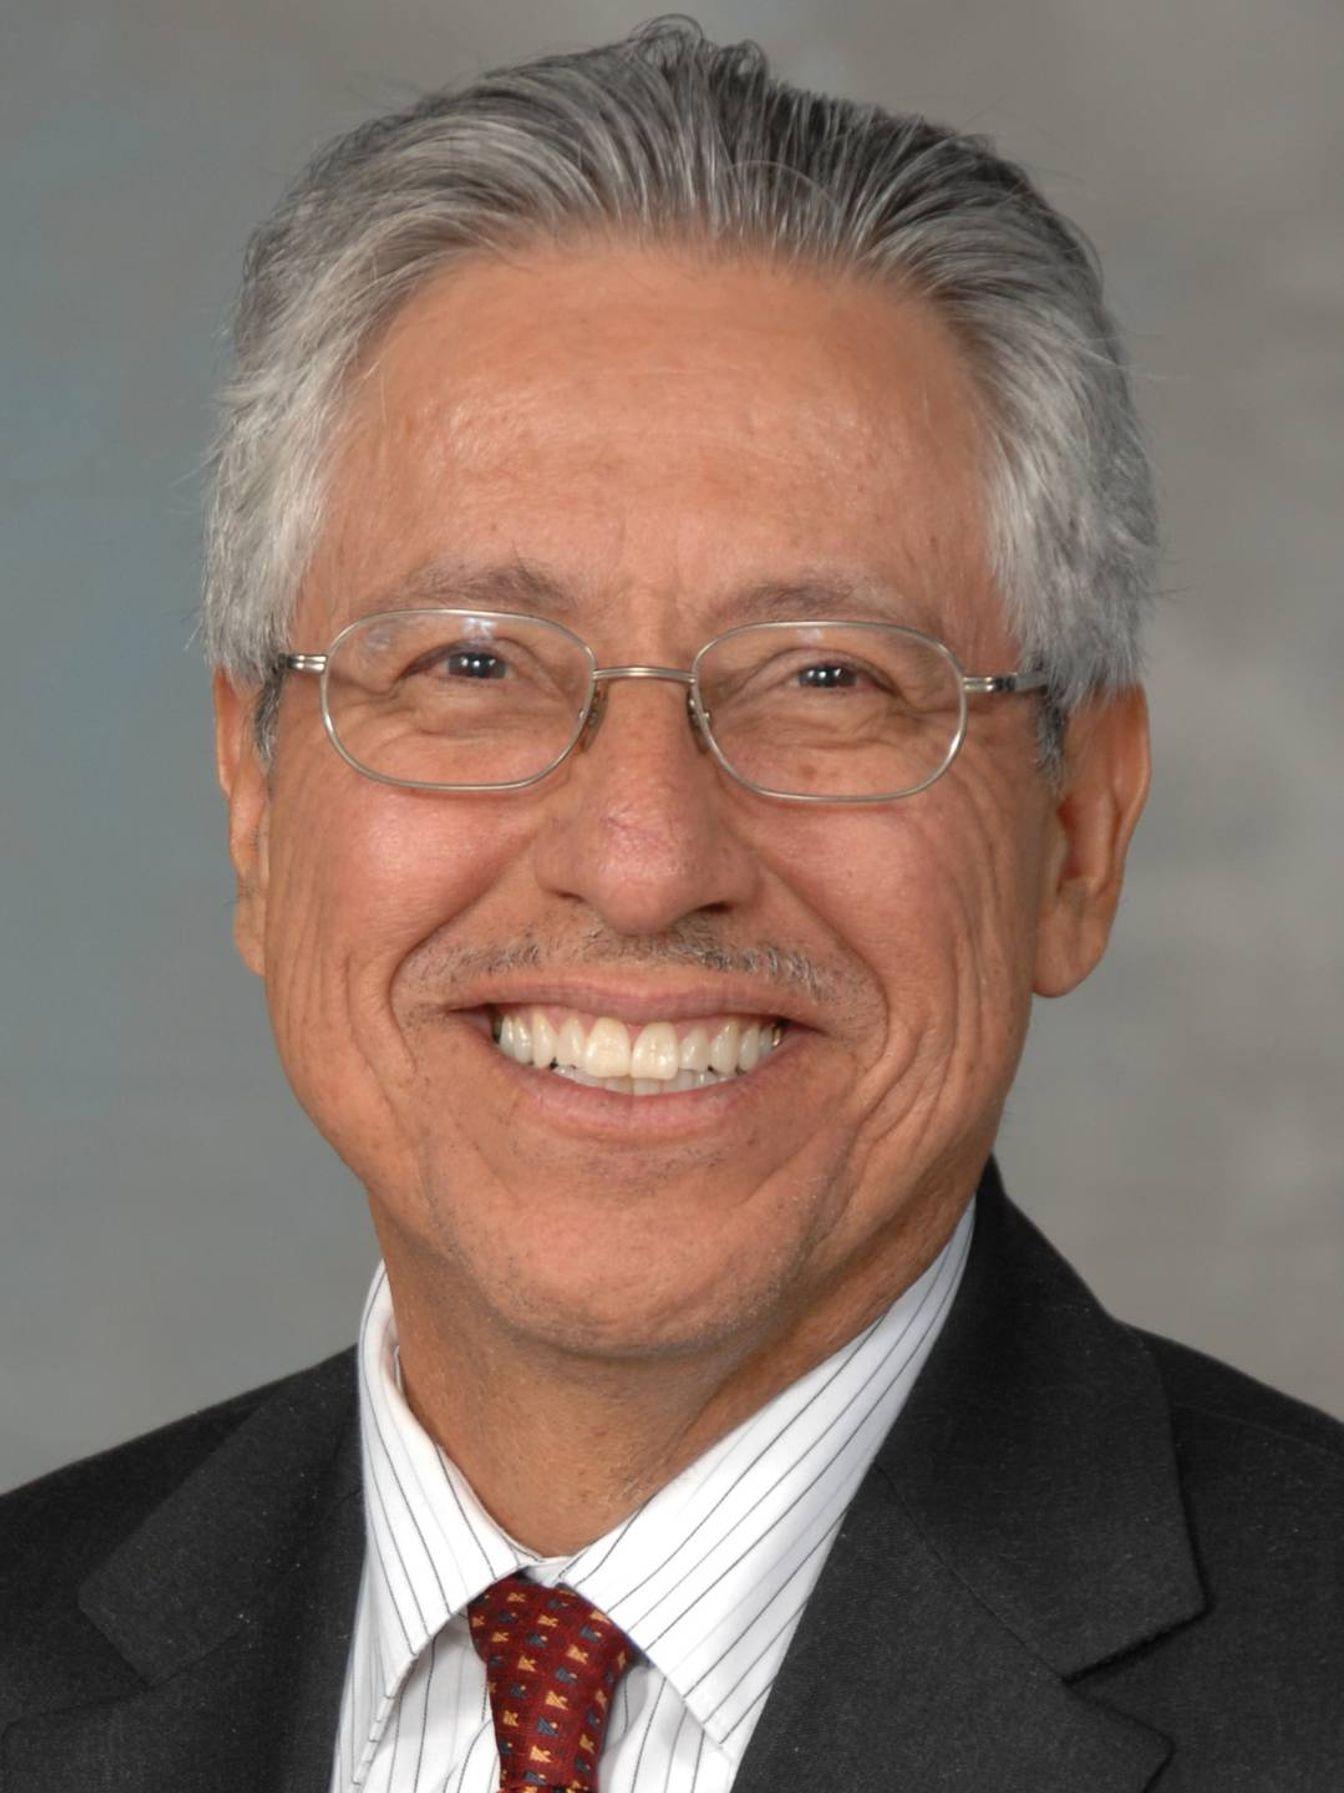 Fernando Torres-Gil, Next Avenue, election results